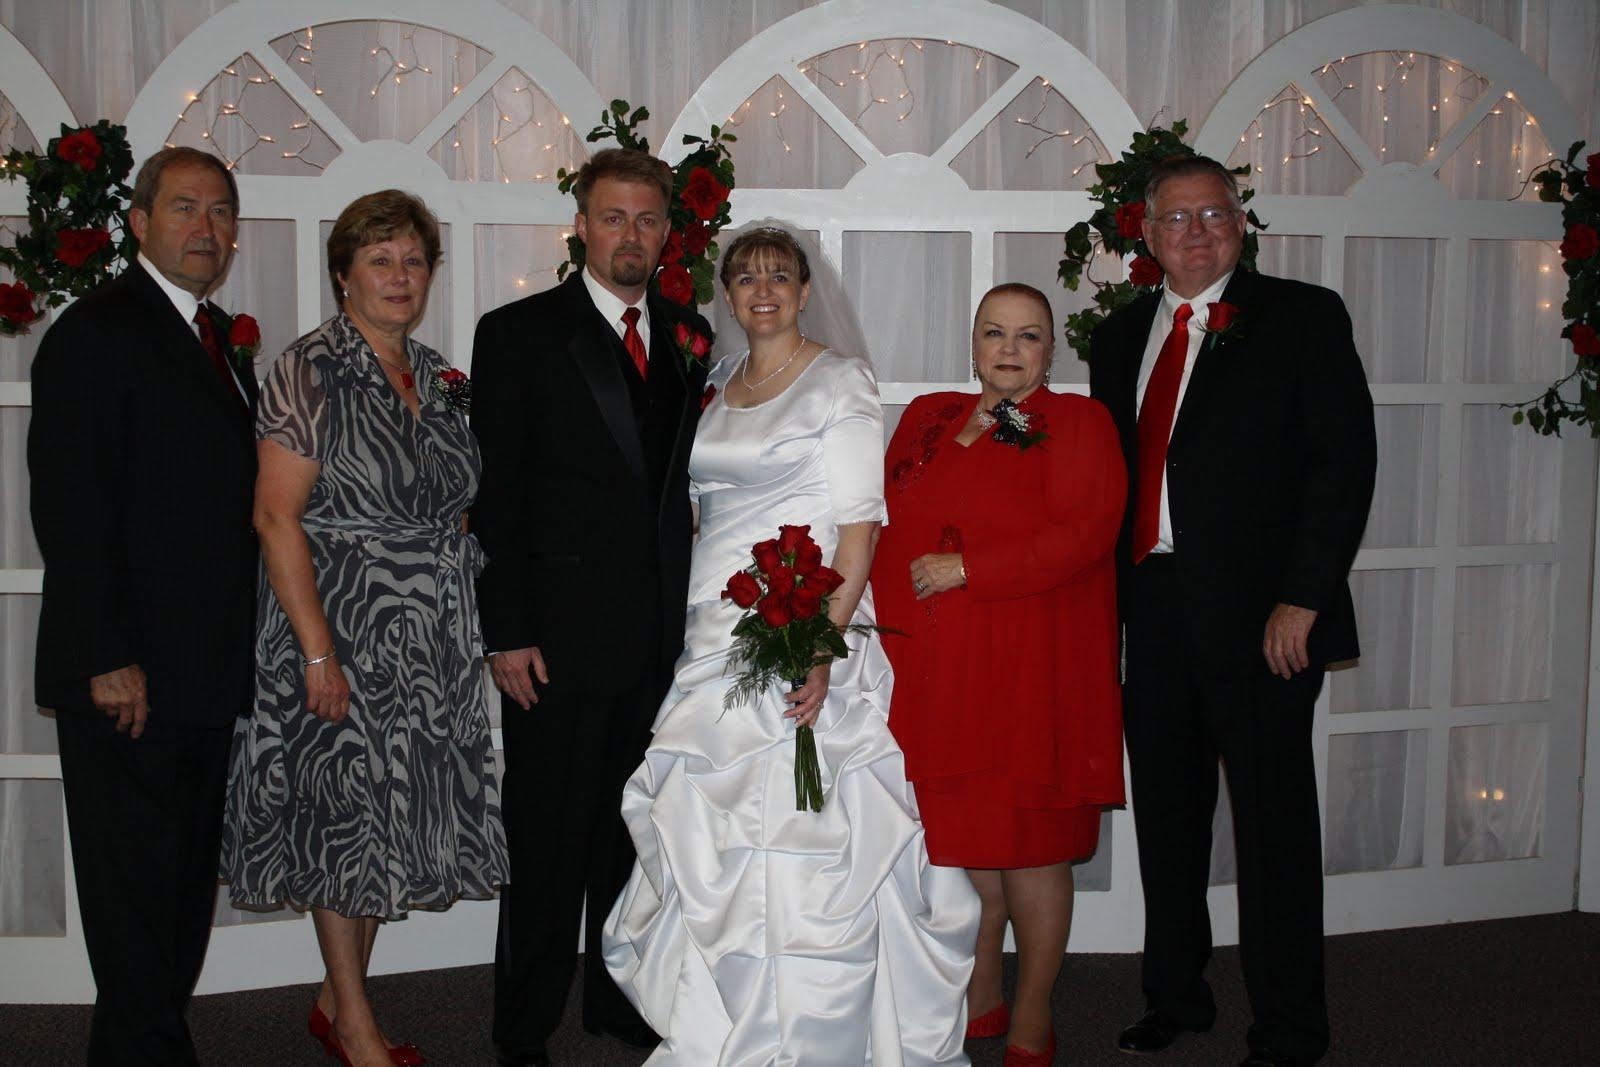 http://4.bp.blogspot.com/_iN8nY_Avlk0/TBaoTnWdKfI/AAAAAAAAAQQ/06Nrt-nJTcs/s1600/wedding+335.jpg